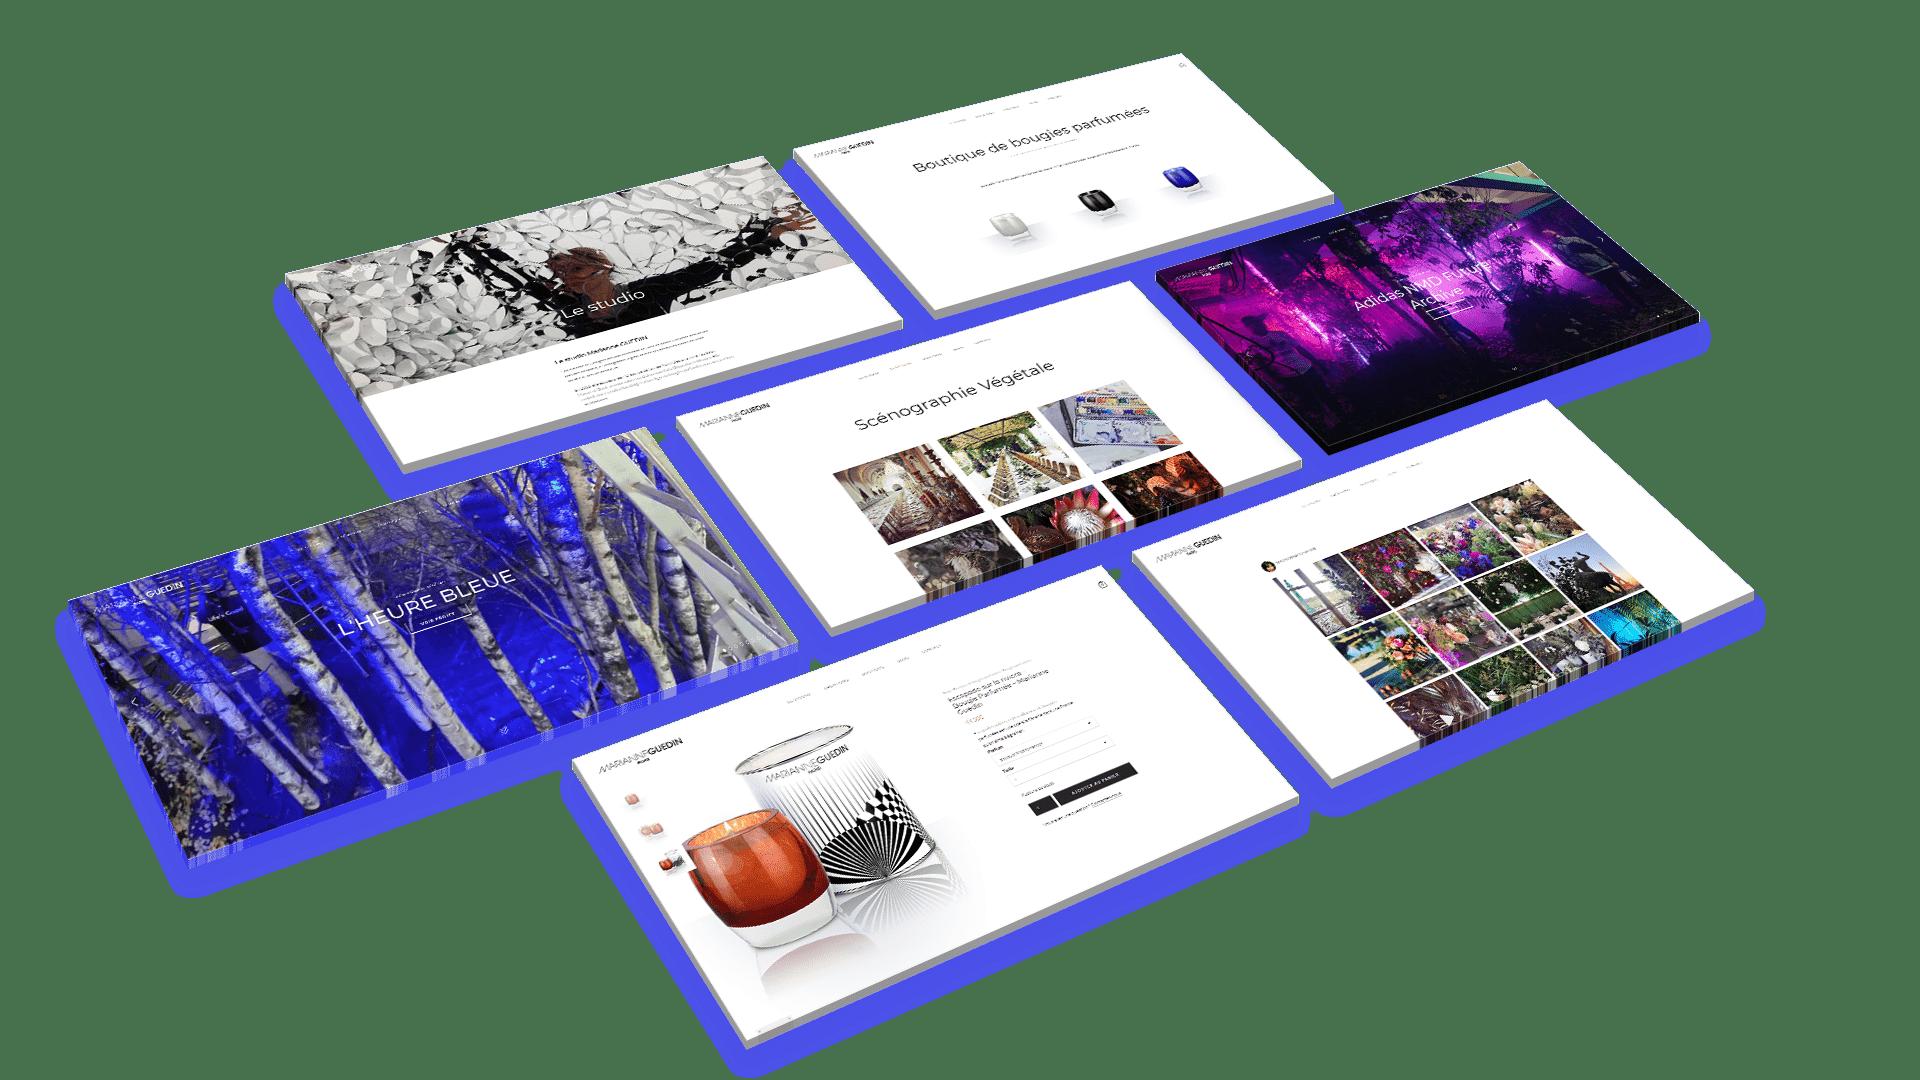 marianne guedin wordpress agence web design lyon arkanite developpement application mobile graphisme logo icones illustration pages